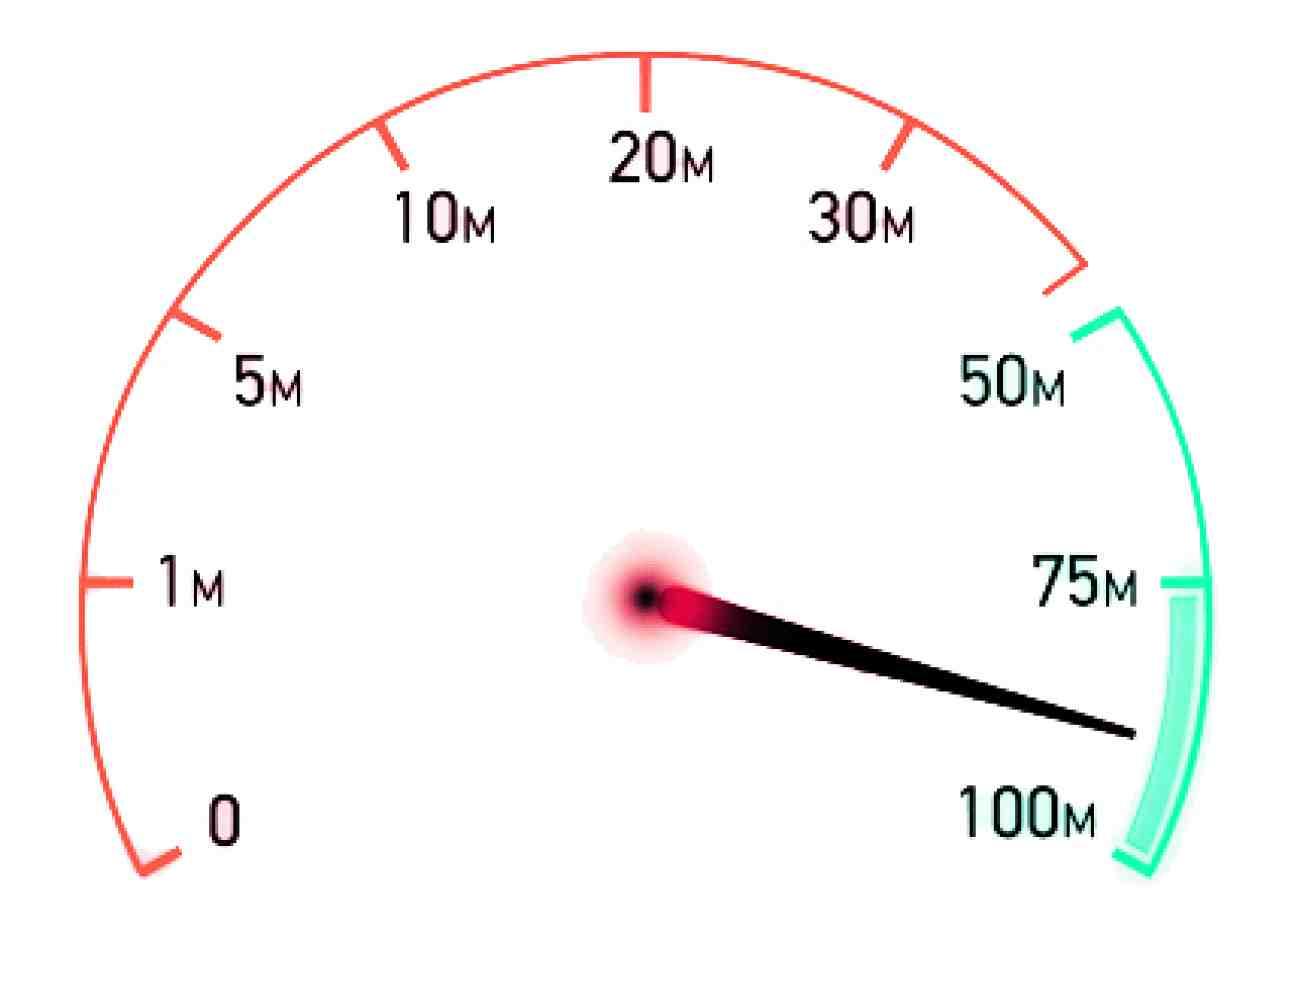 UFB broadband VDSL speed image